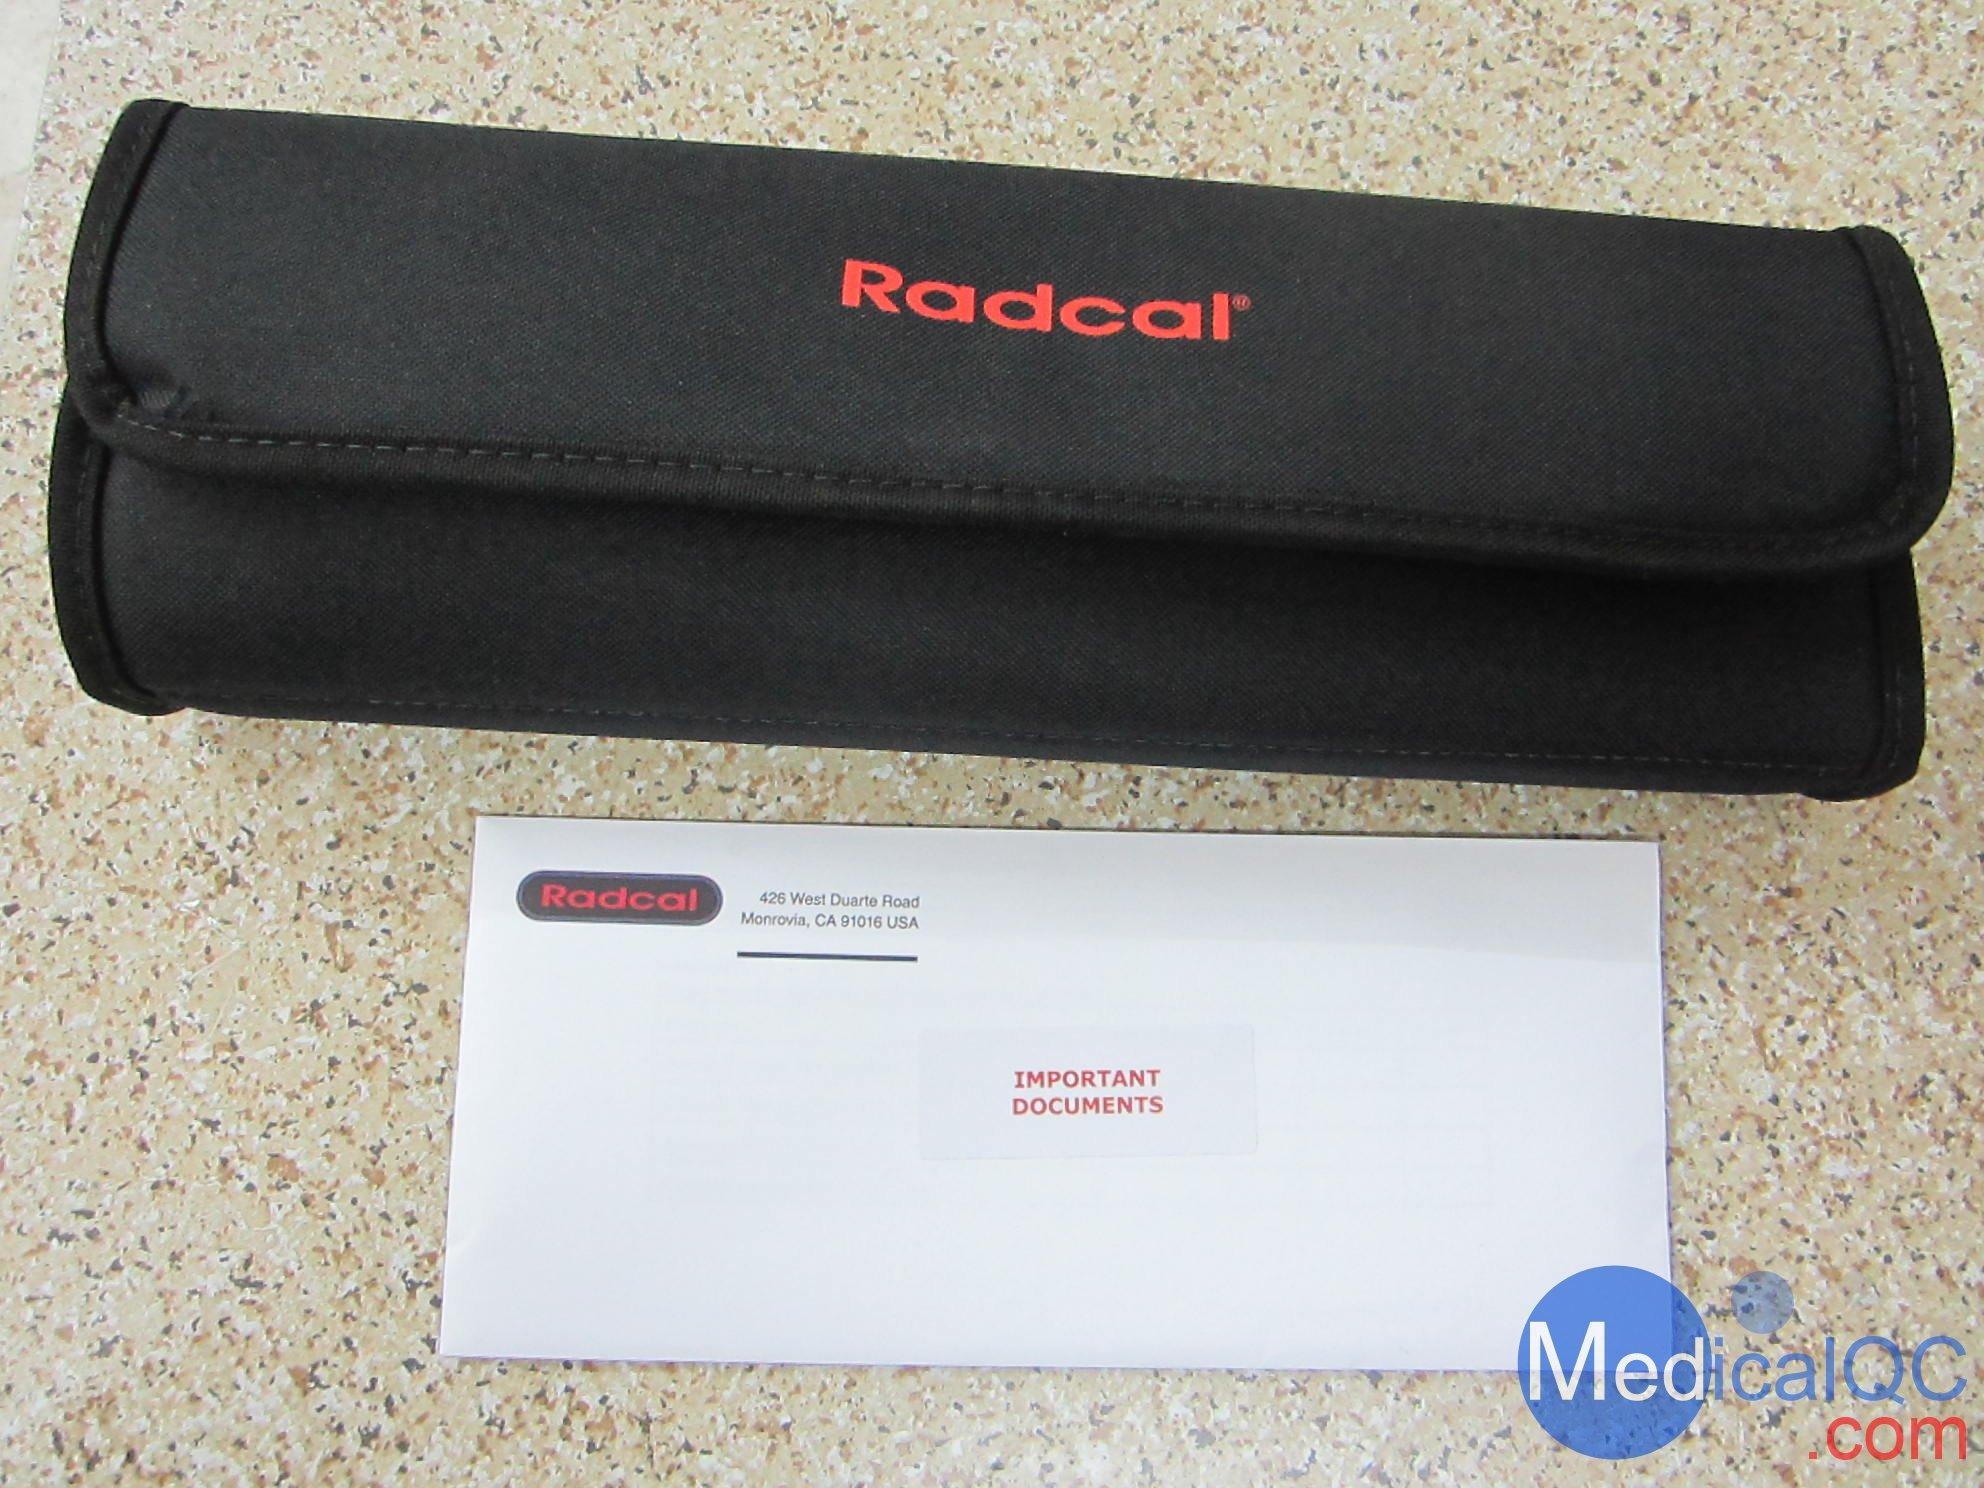 Radcal ACCU-GOLD+ X射线综合测试仪,ACCU-GOLD+ X射线分析仪